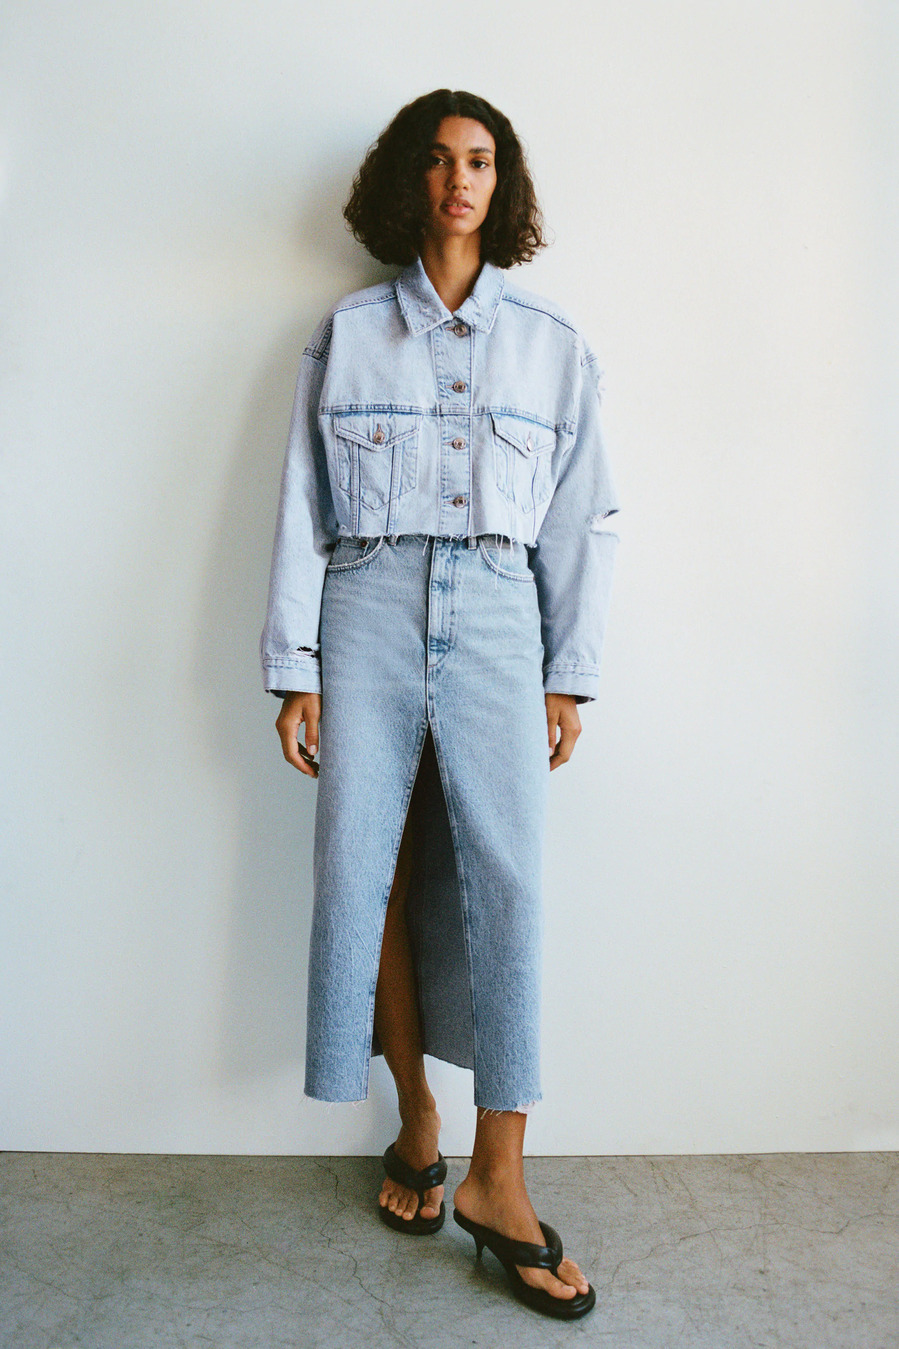 Falda larga + Cazadora 'cropped' - 20 buenas ideas para vestir denim de pies a cabeza